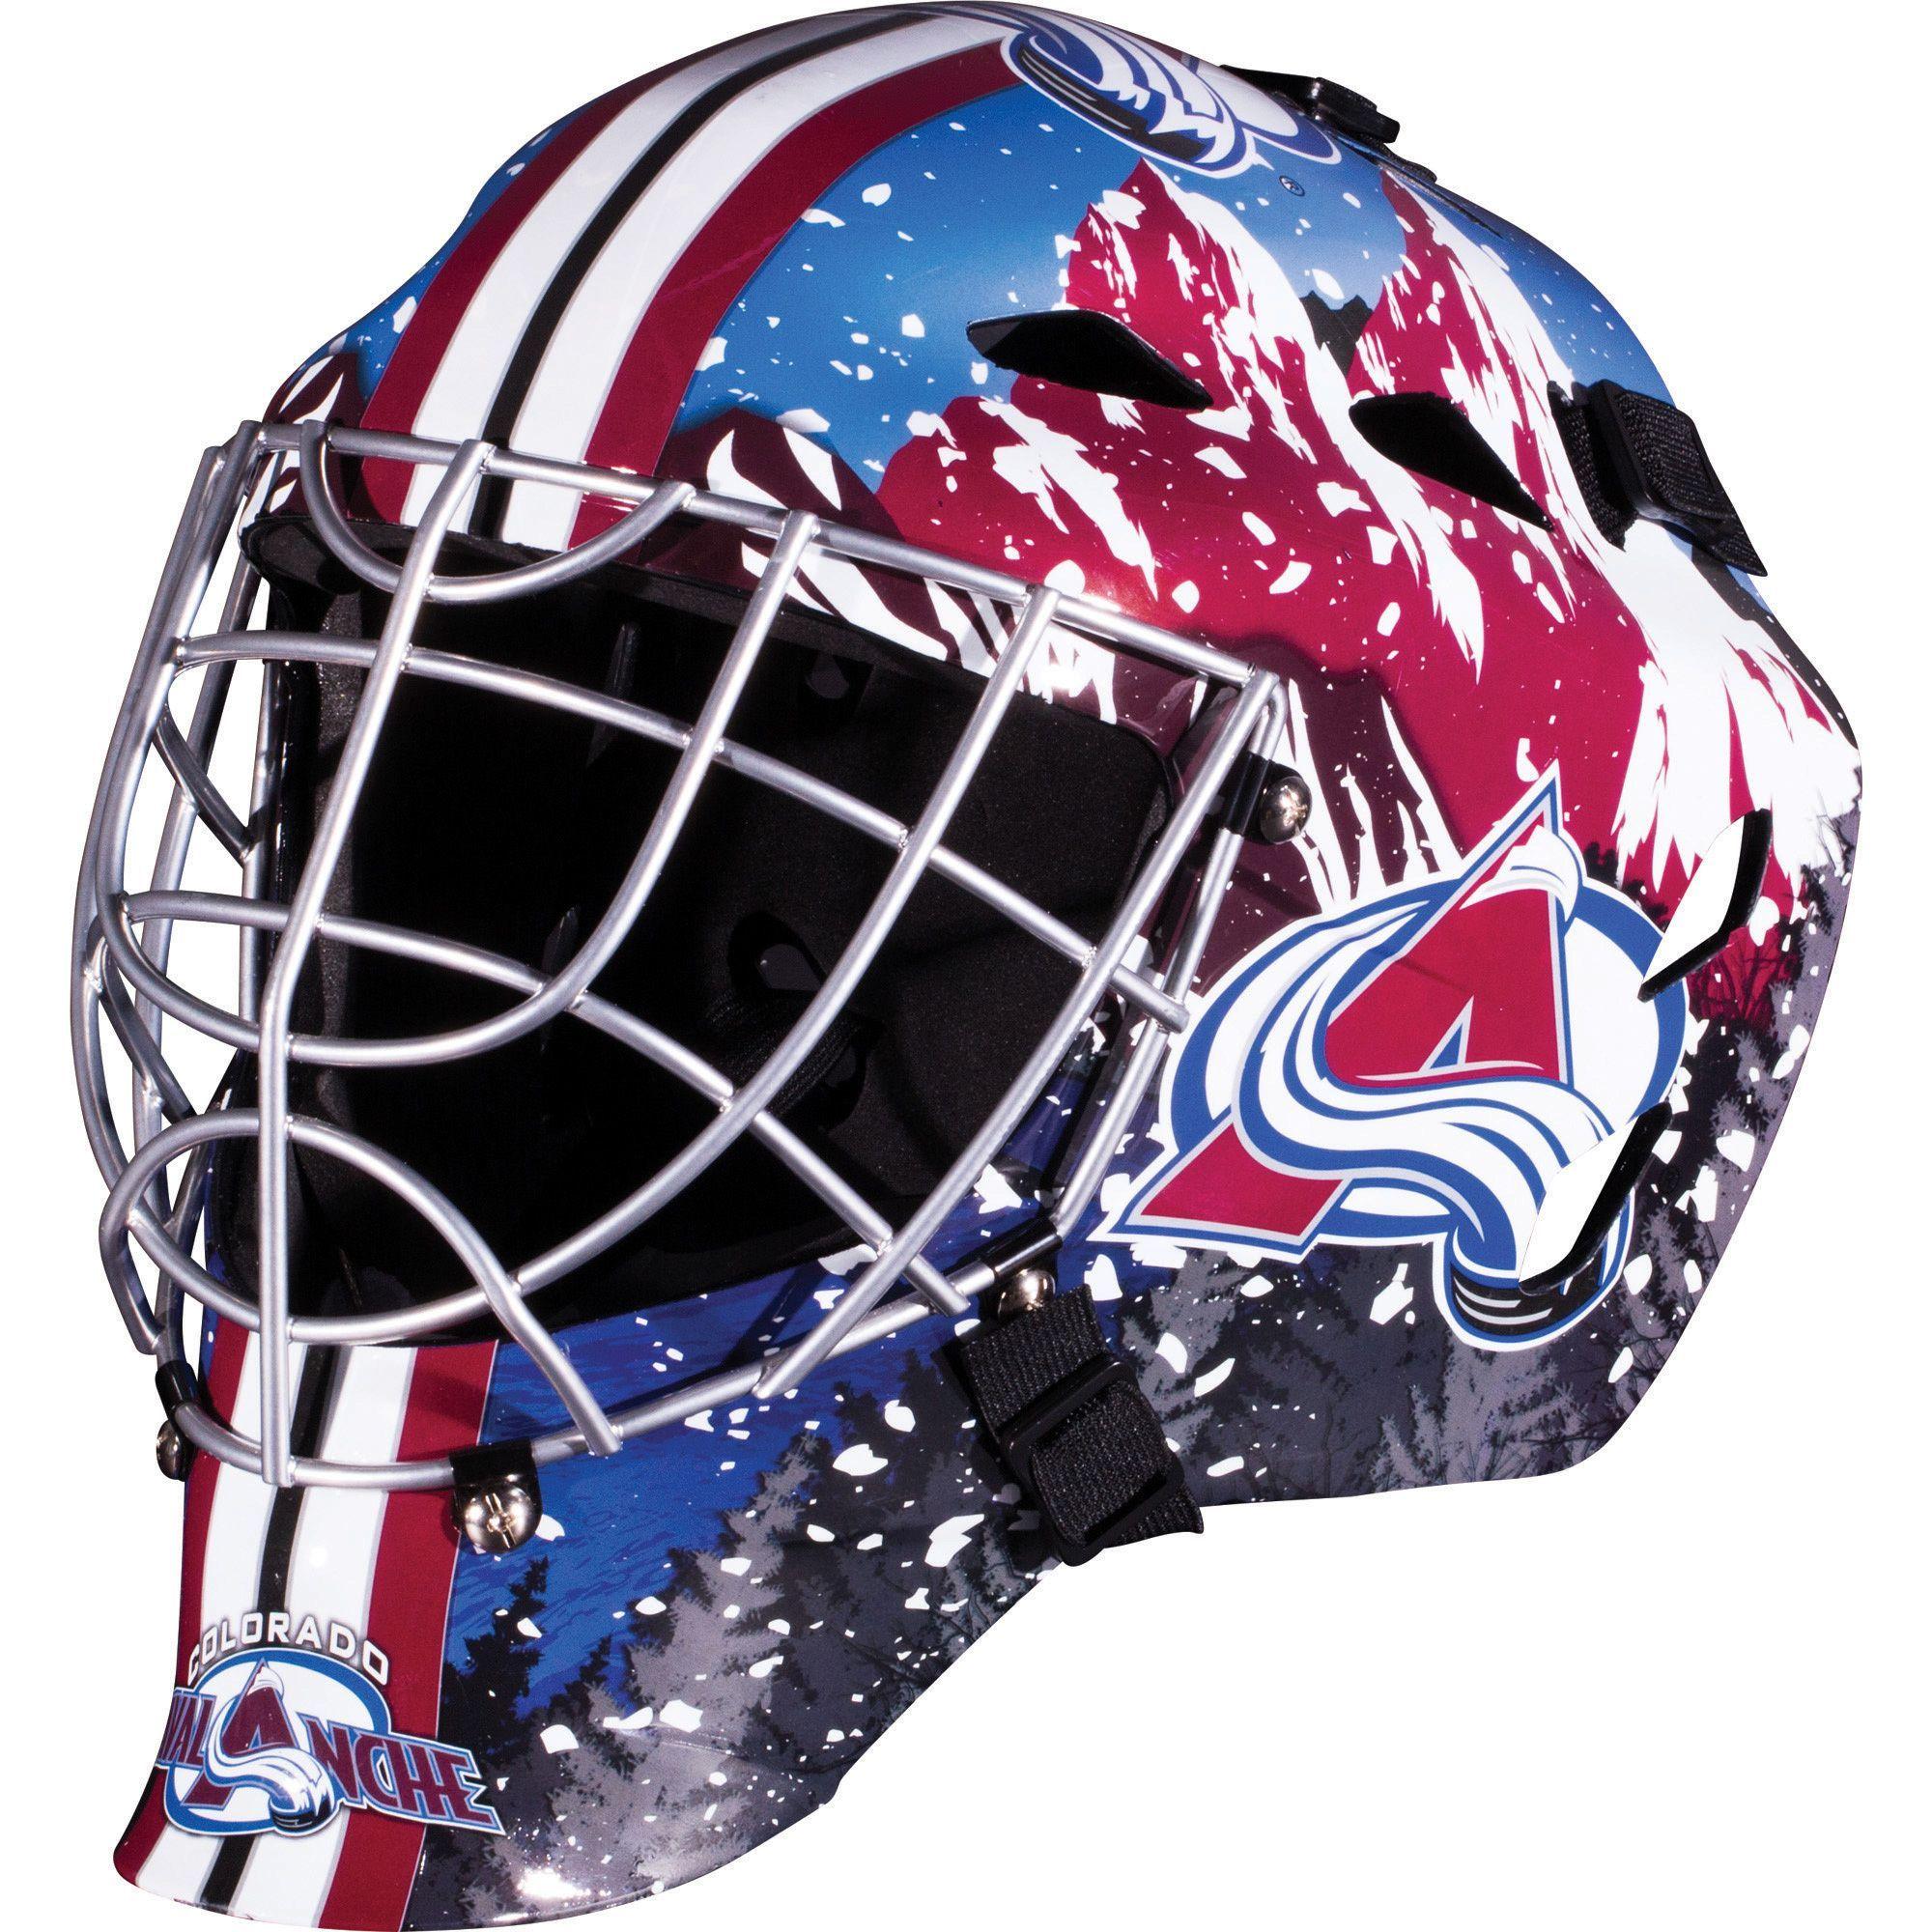 Franklin Sports Nhl Team Goalie Mask One Size Fits Most Franklin Sports Goalie Mask Street Hockey